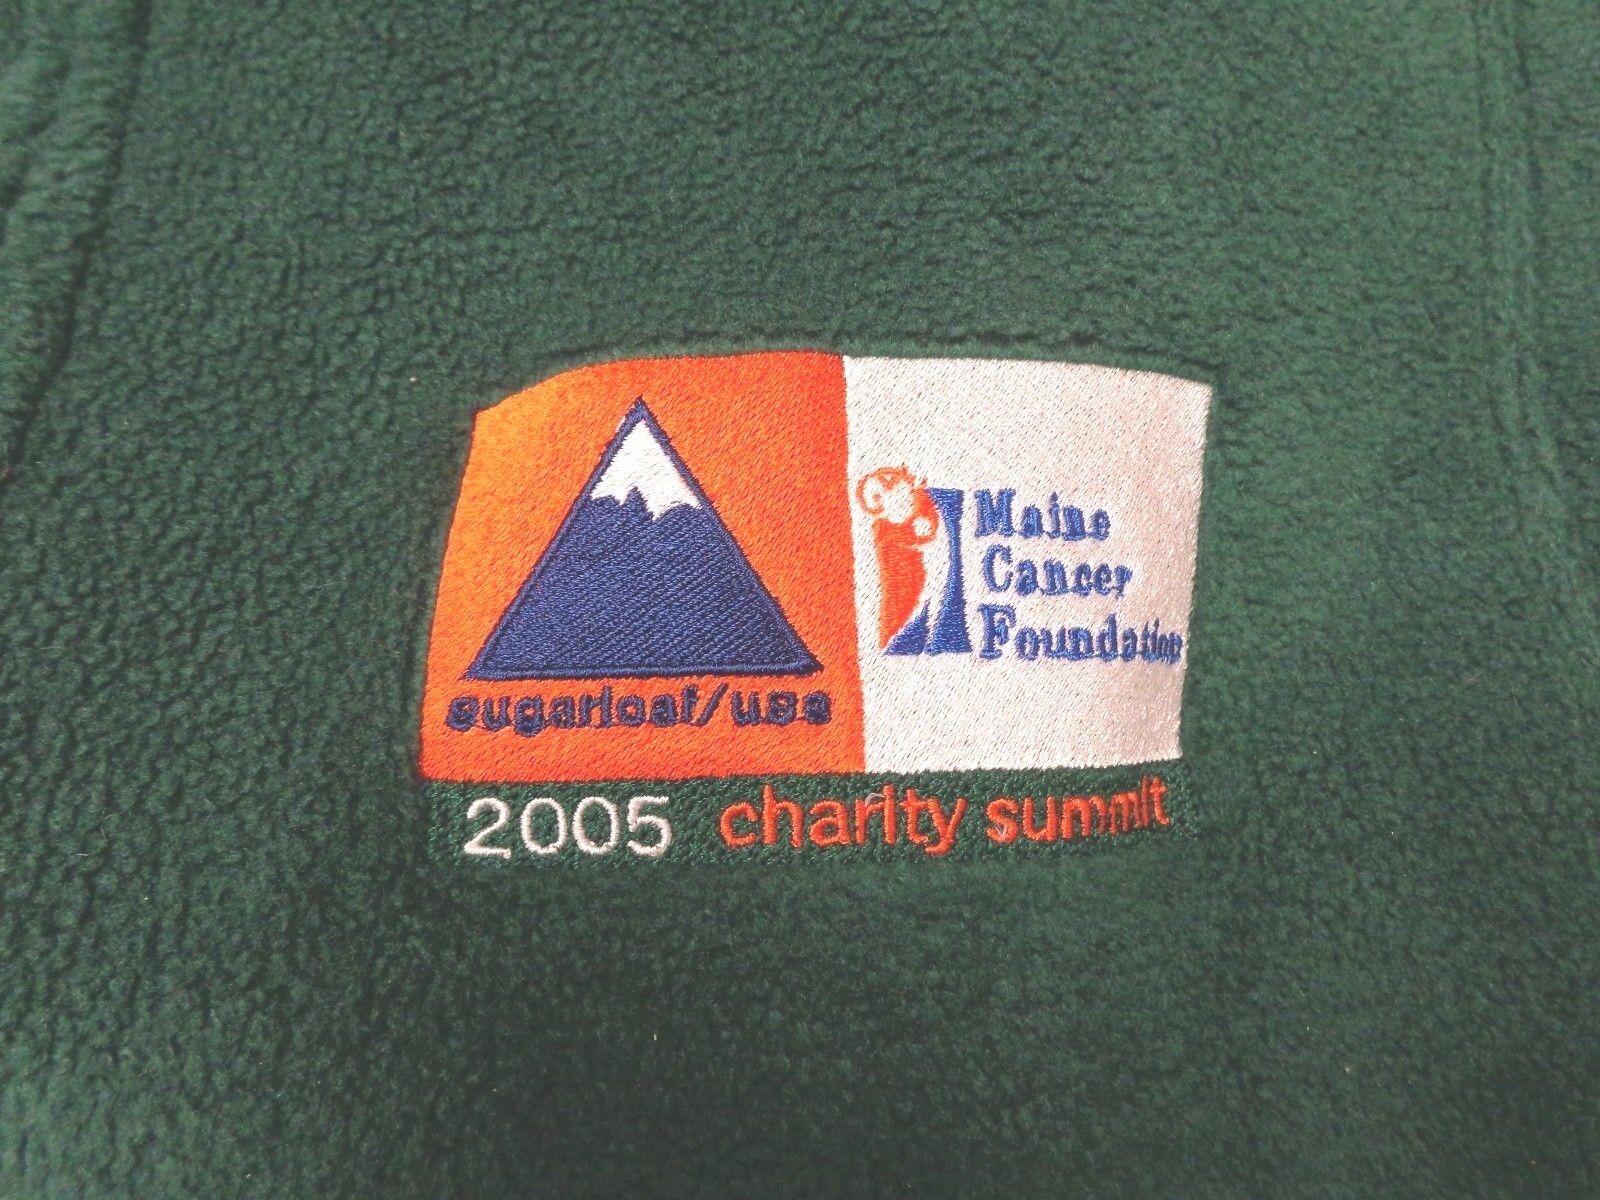 SUGARLOAF   USA MAINE CANCER FOUNDATION 2005 CHARITY SUMMIT GREEN FLEECE VEST L